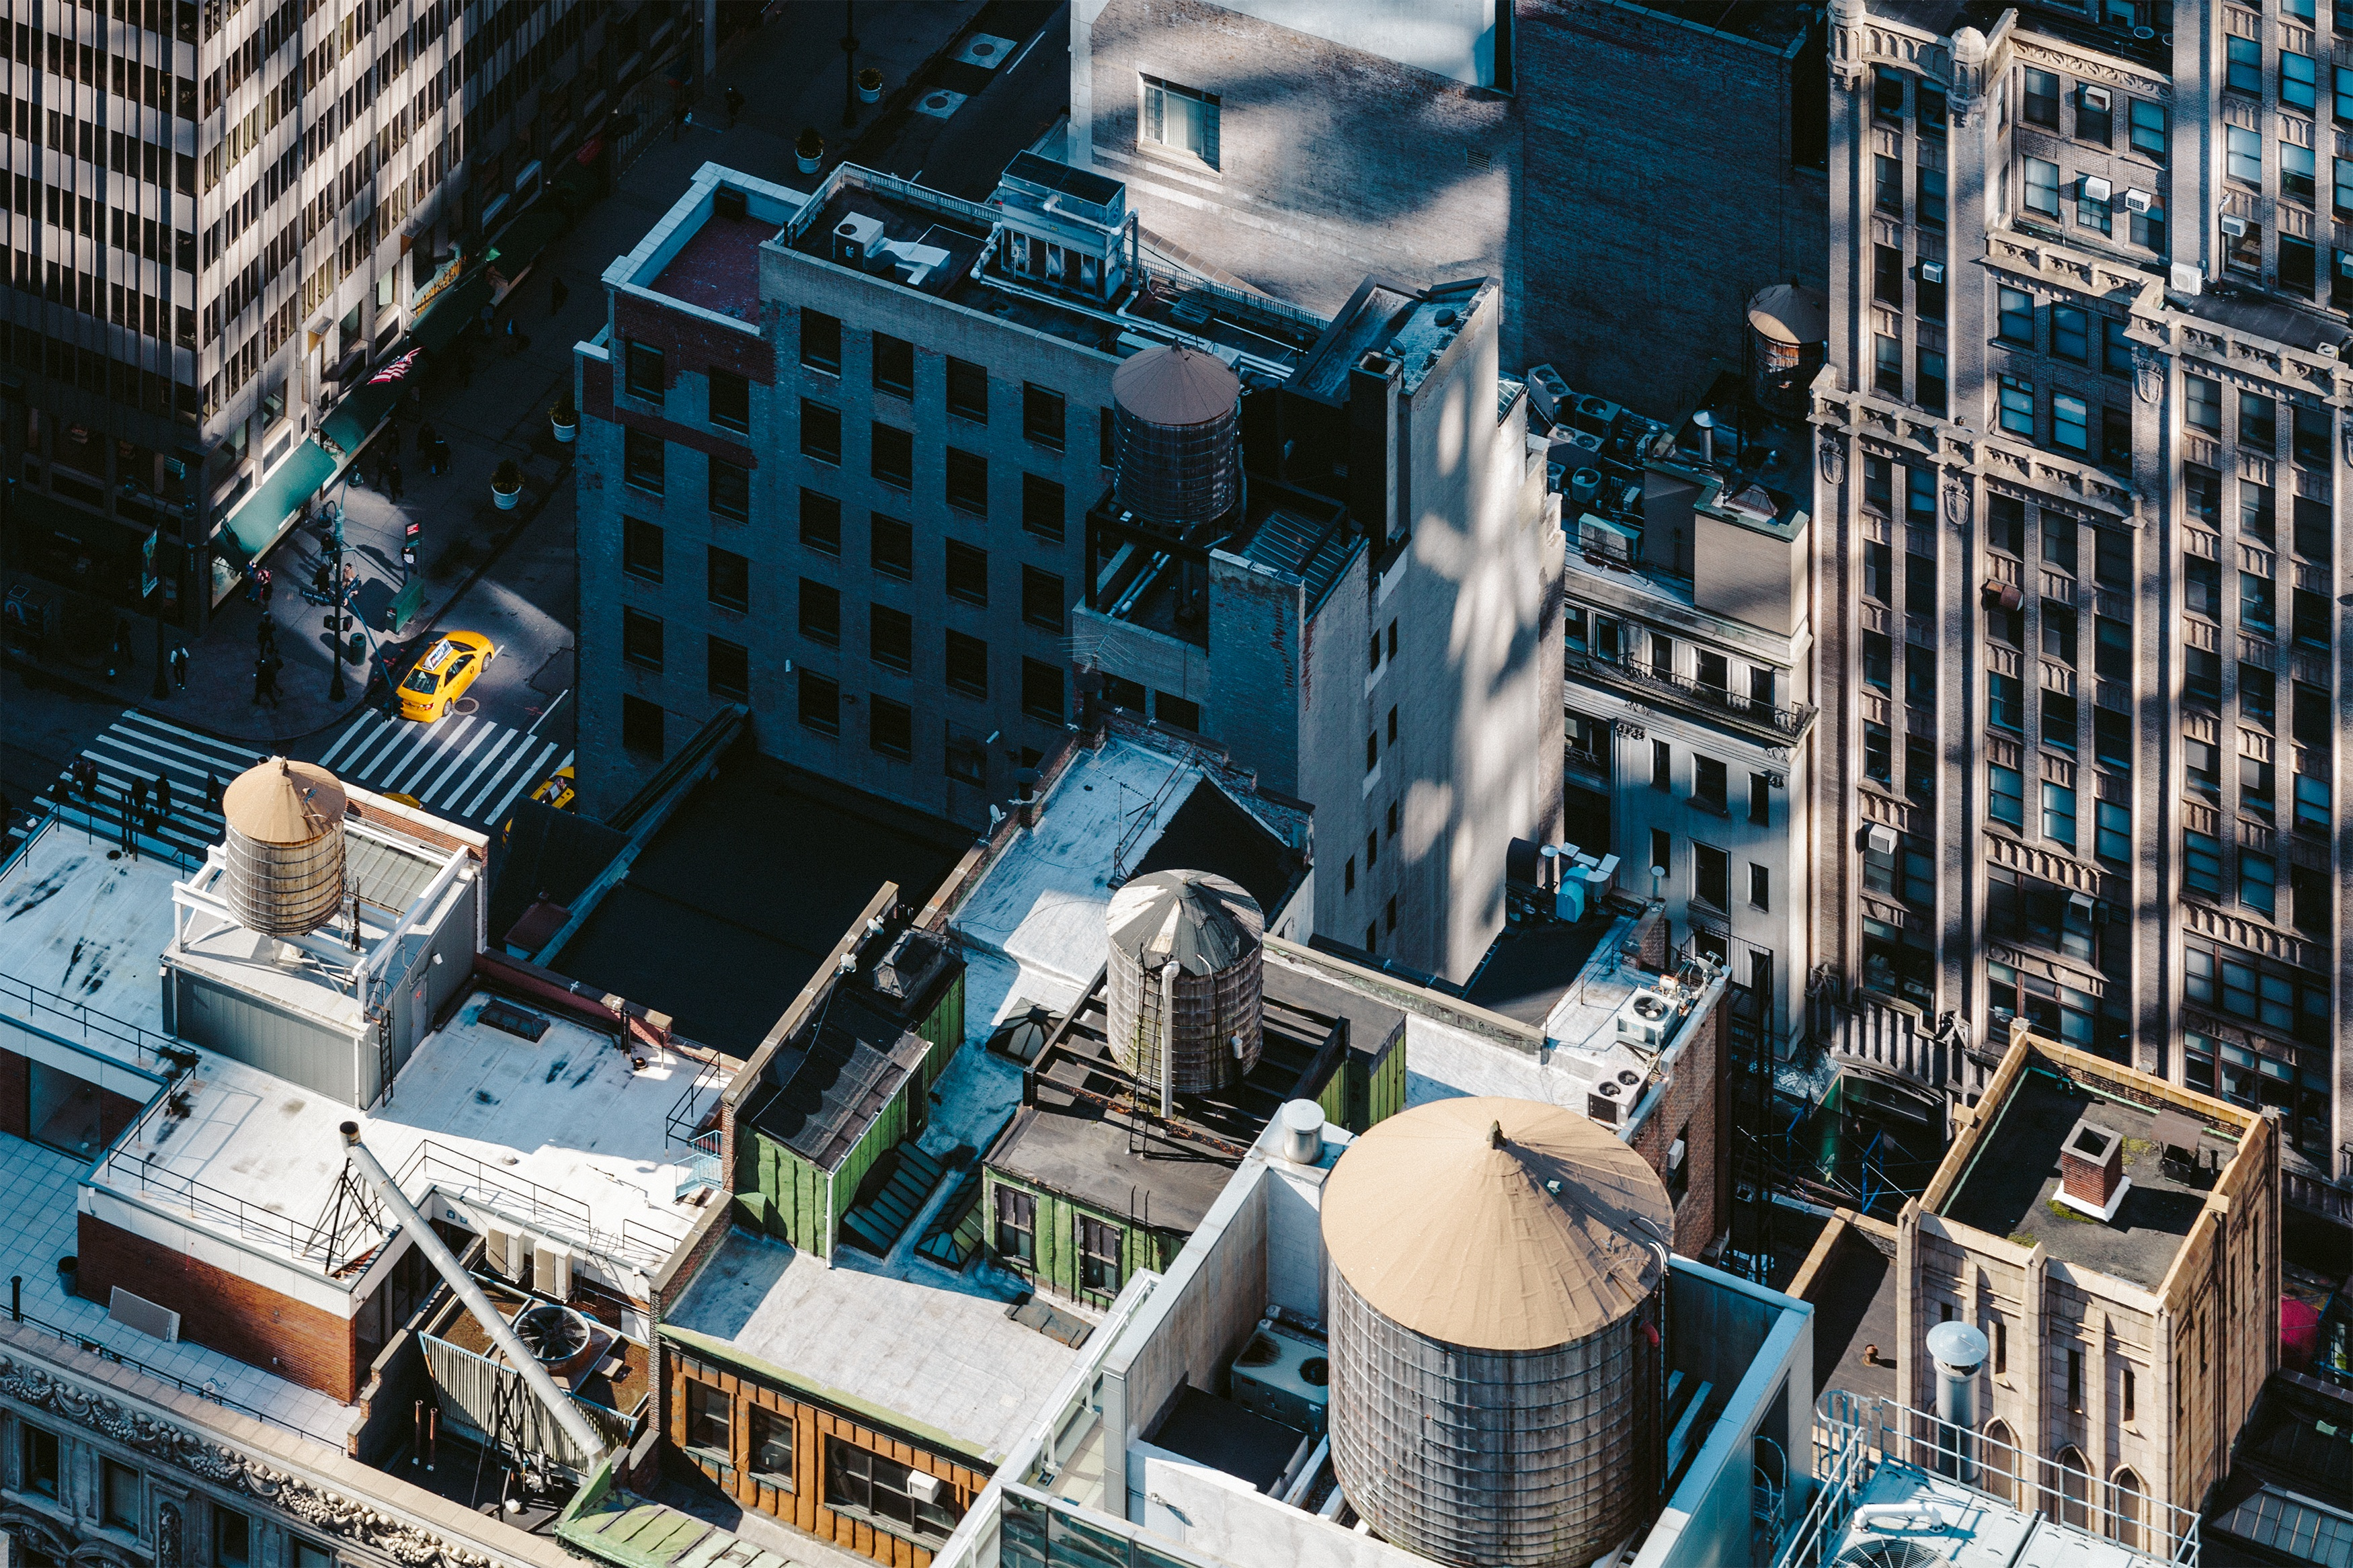 New York rooftops, roofs, terraces, city, urban, street, buildings, skyscrapers,